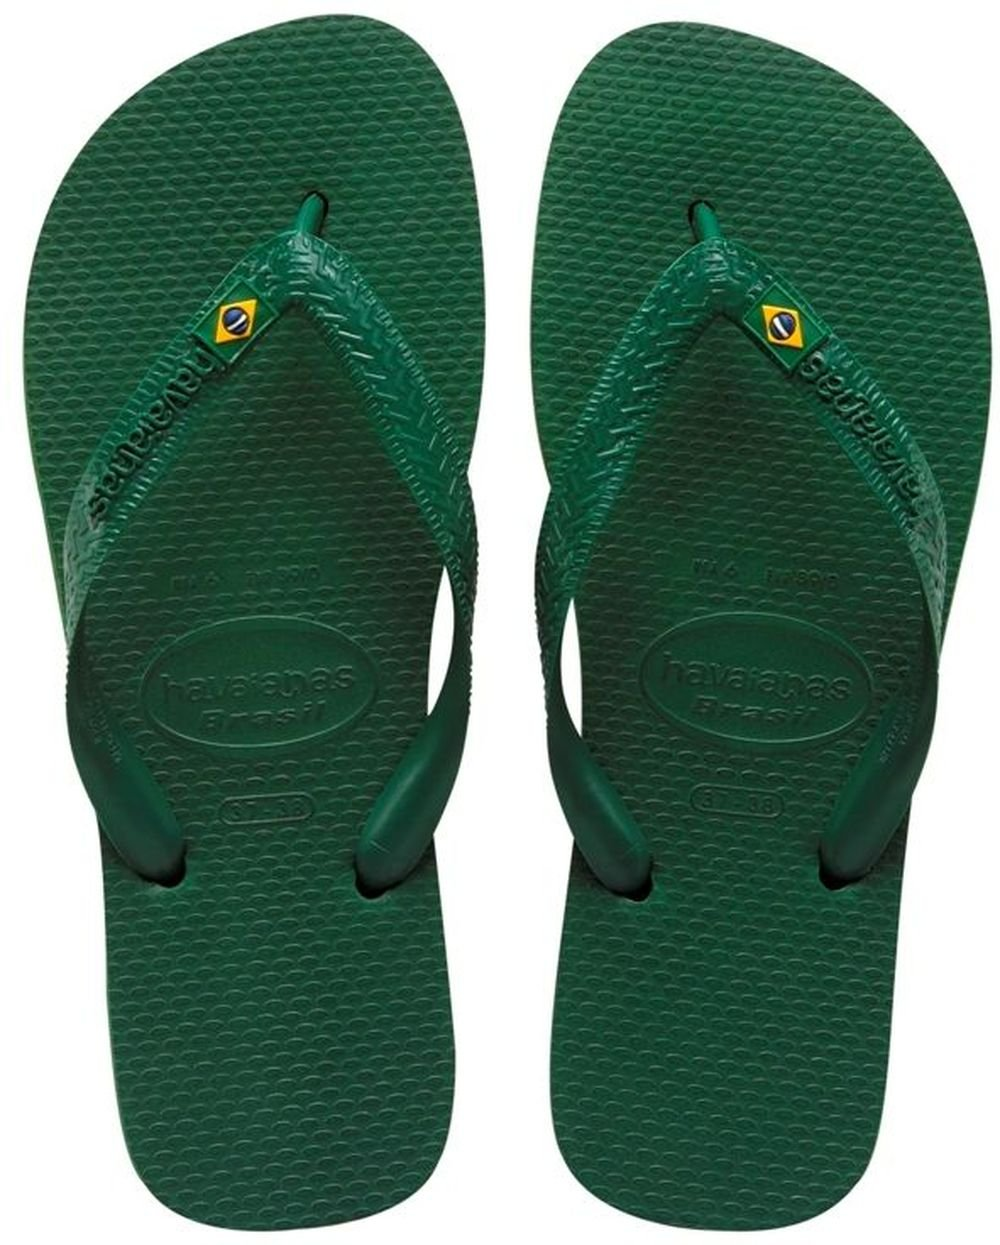 Havaianas Brasil, Unisex Adult's Flip Flops, Green (Brasil Amazonia), 3/4 UK (37/38EU) (35/36 BR) by Havaianas (Image #2)